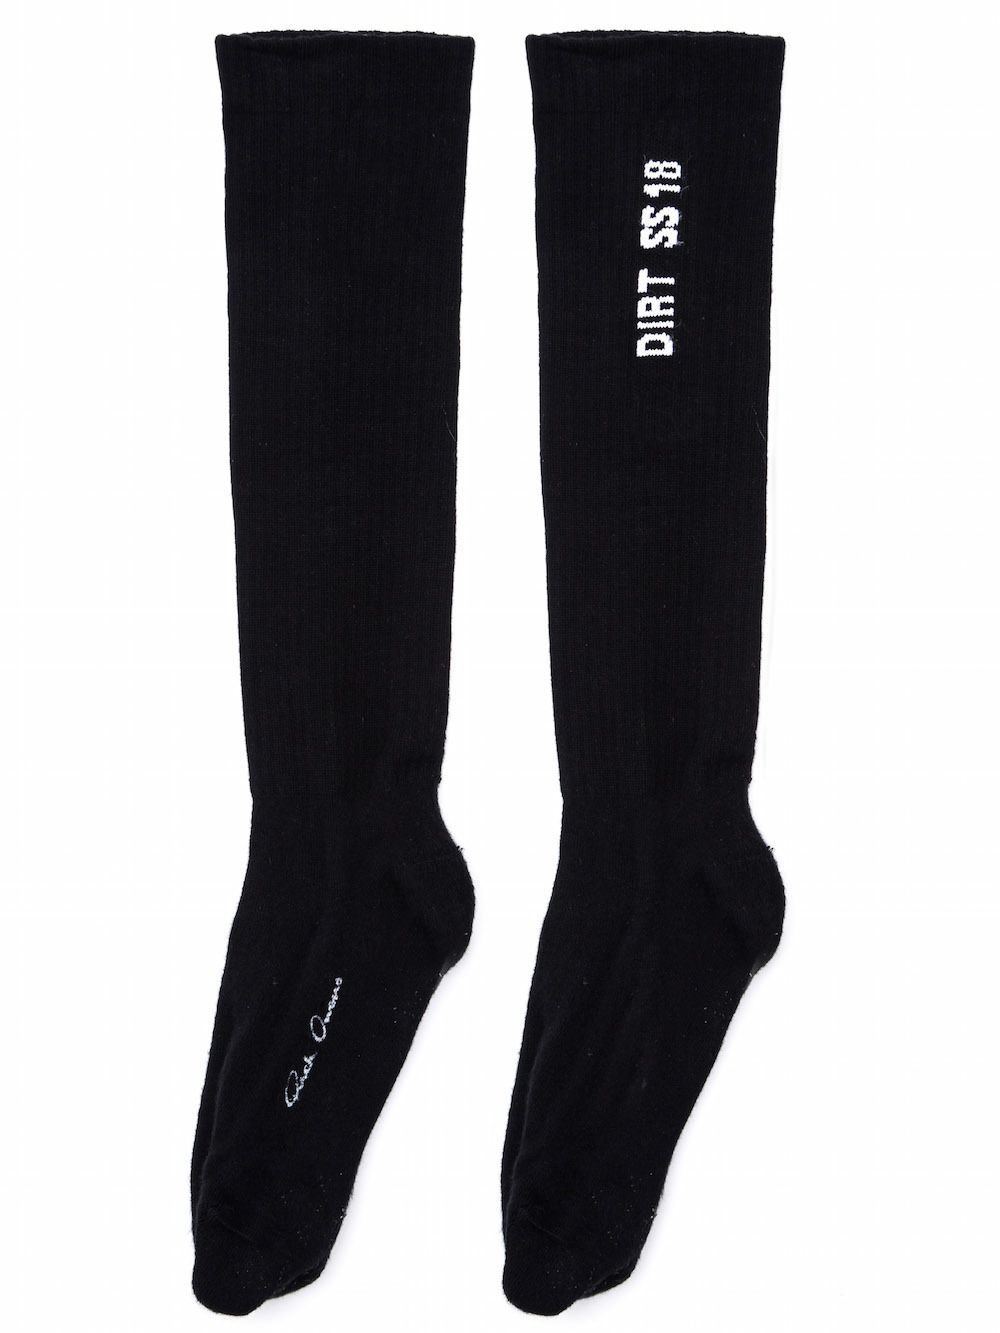 Rick Owens SS18 Dirt socks tncBaZ